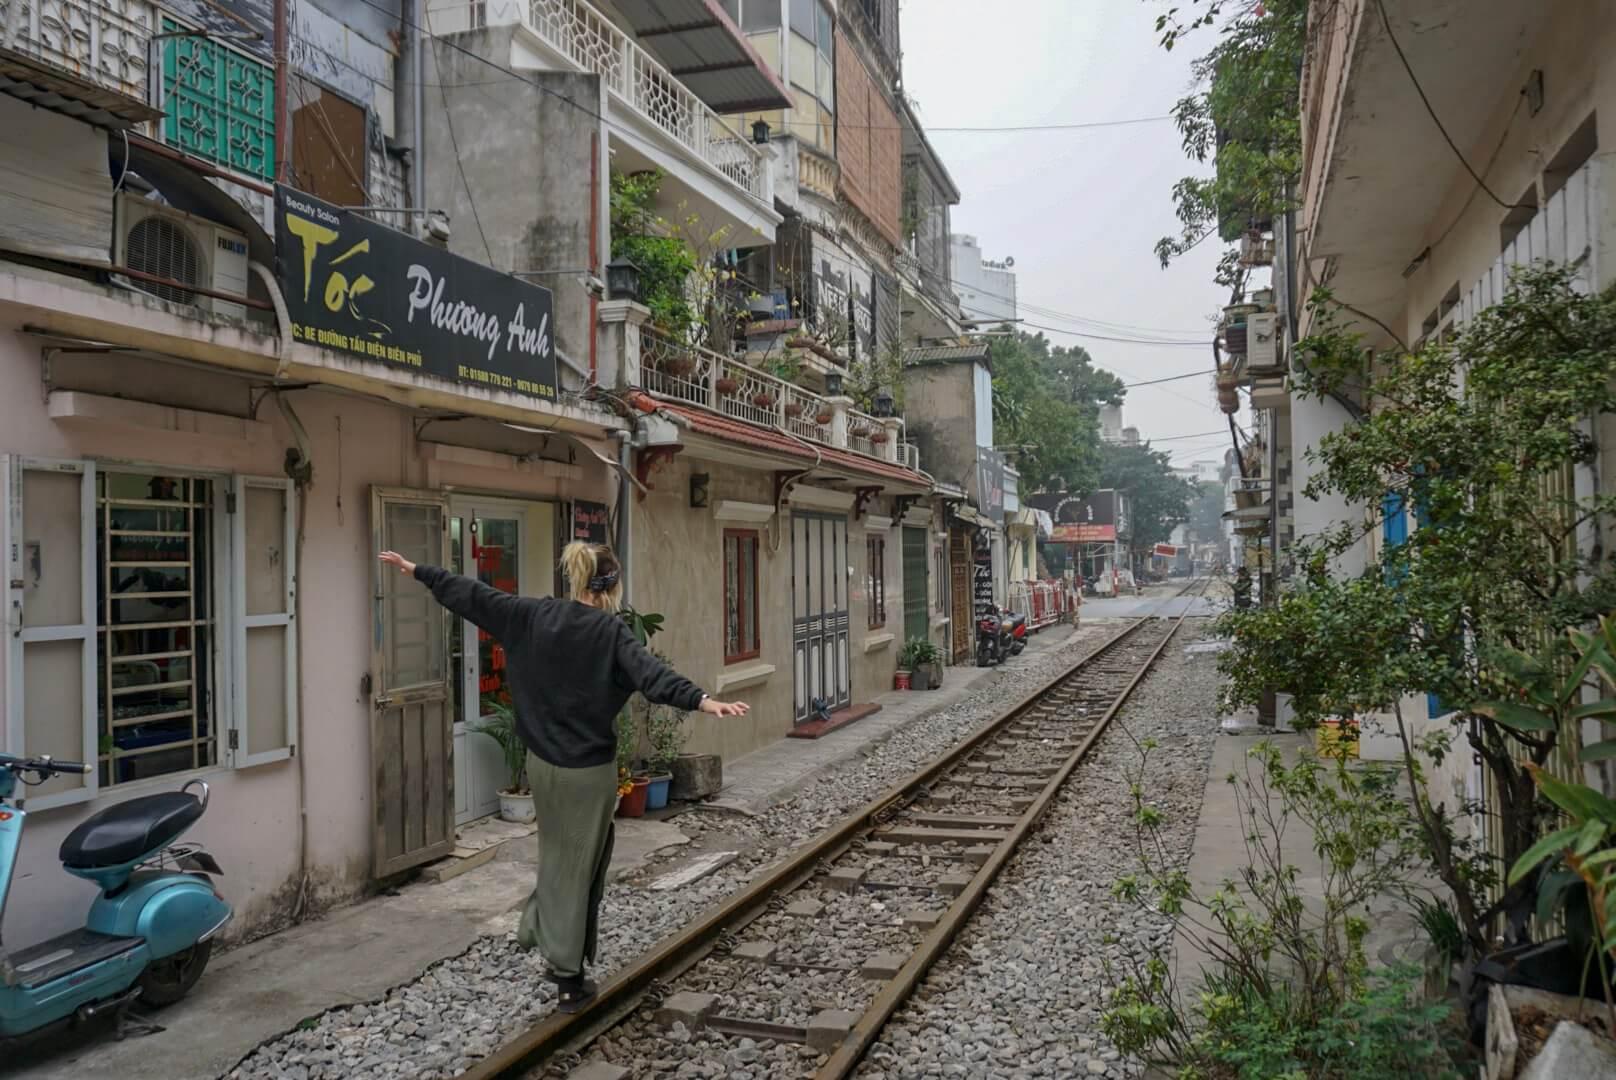 Train rue hanoi voie ferrée vietnam